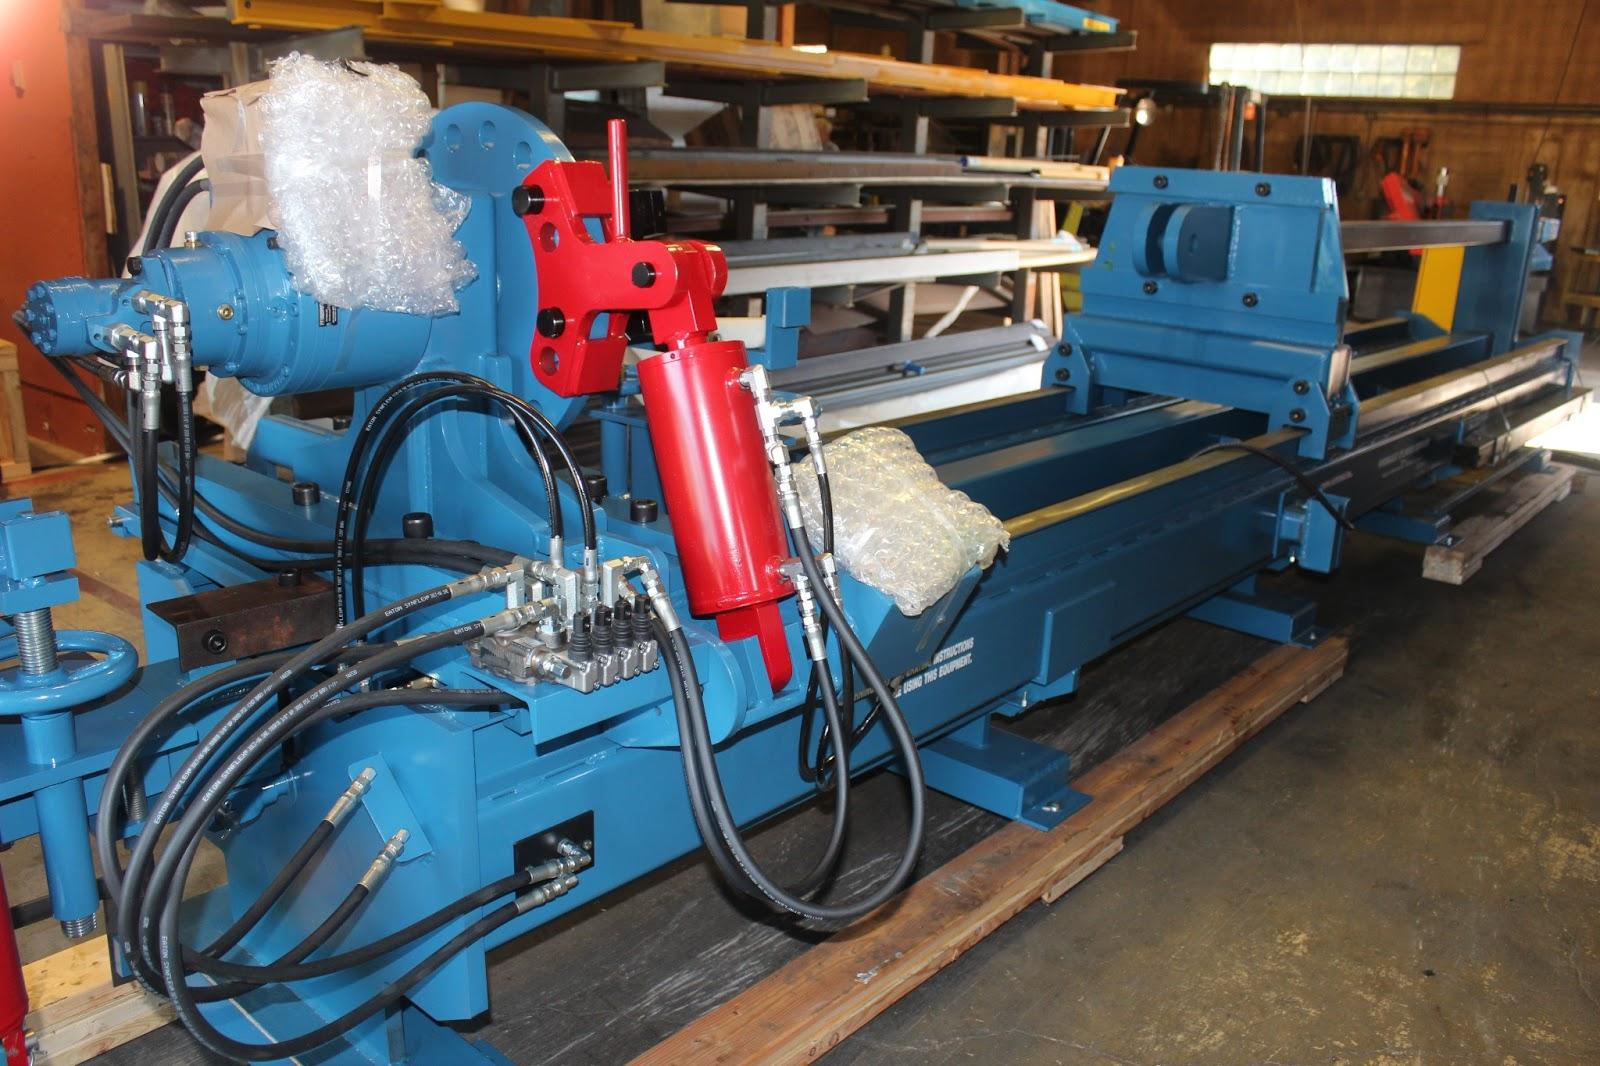 Hems Cylinder Repair Bench For Hitachi Dealers Hems Ltd